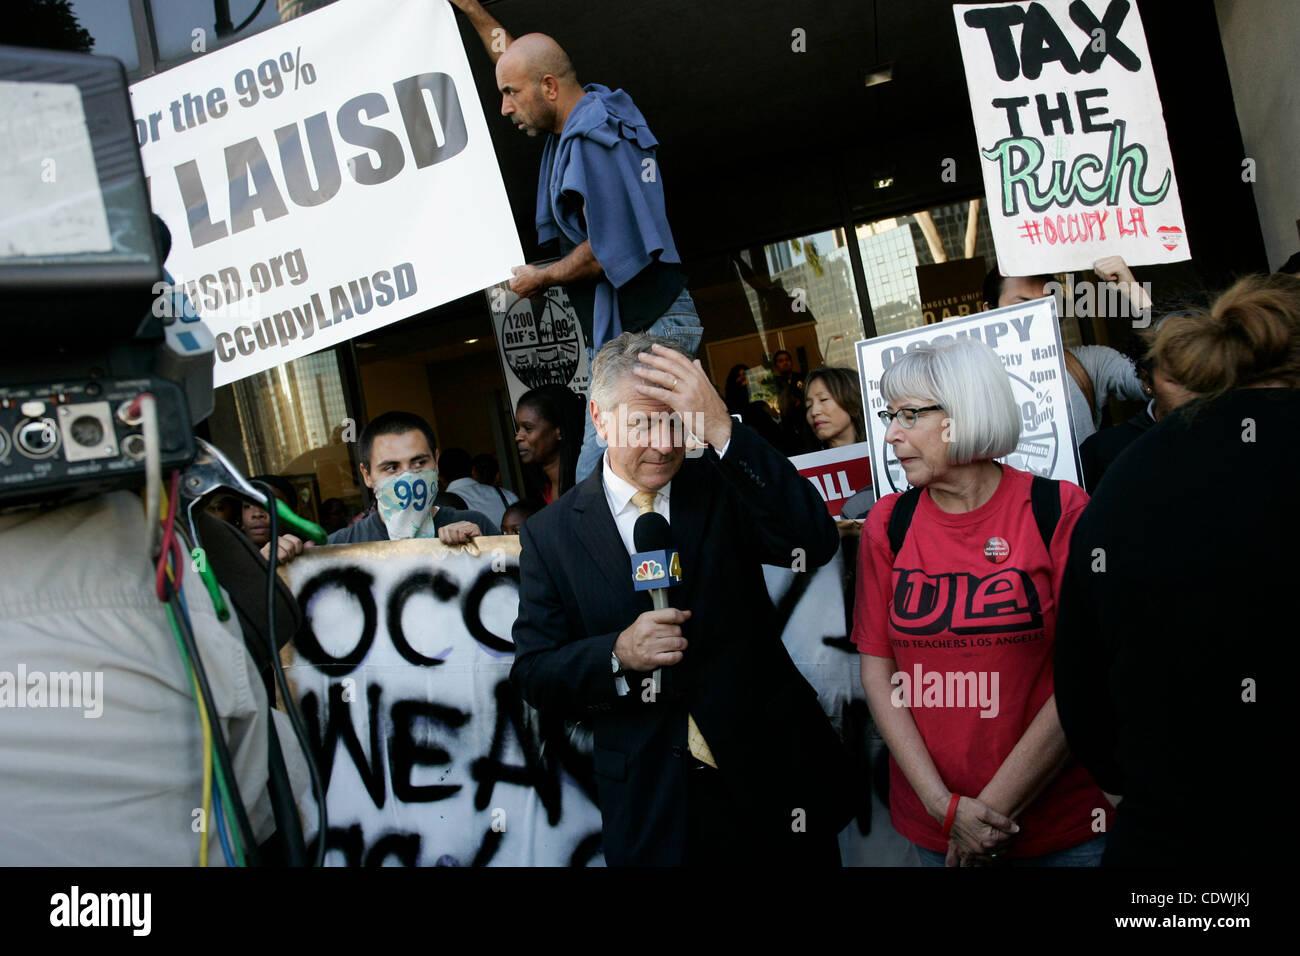 Oct. 18, 2011 - Los Angeles, California, U.S - NBC LA reporter Conan Nolan at a protest by parents, teachers and - Stock Image